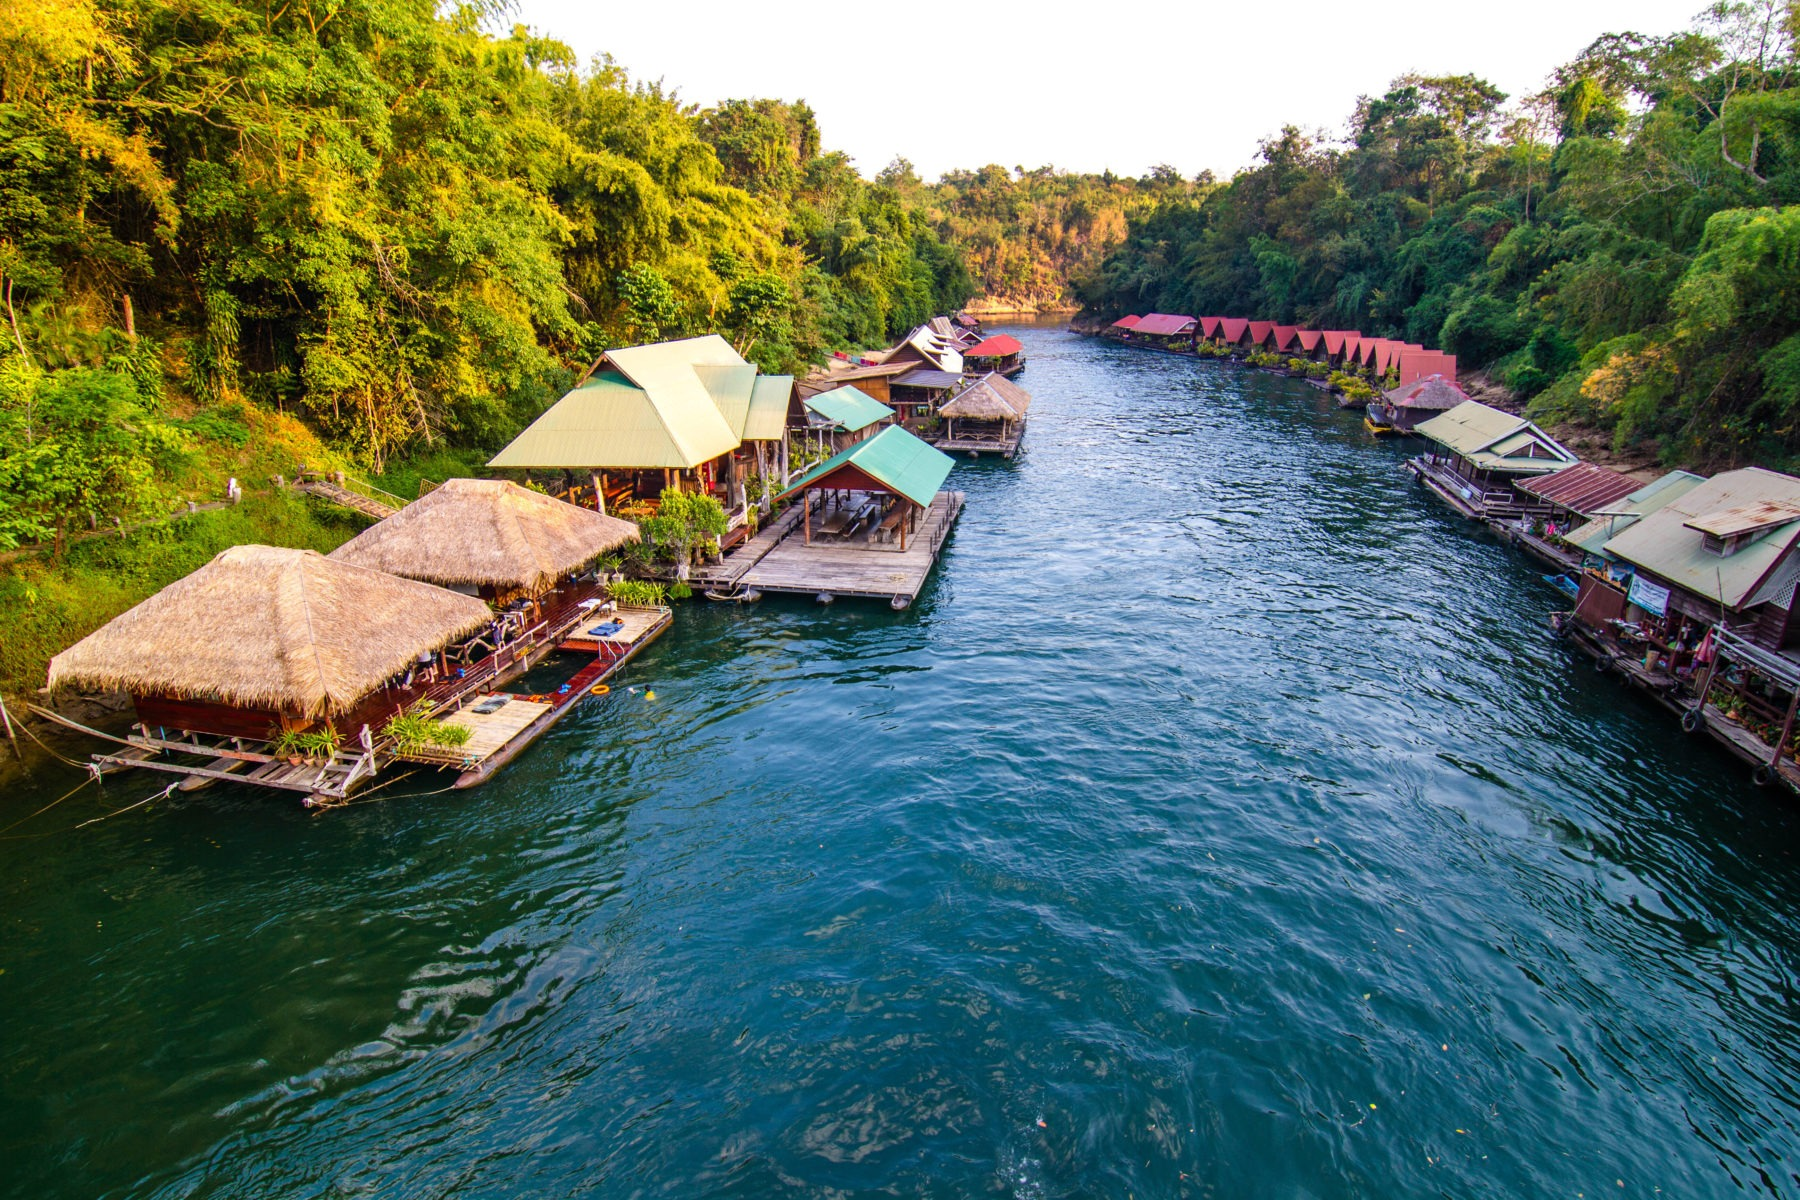 voyage organisé thailand perraud